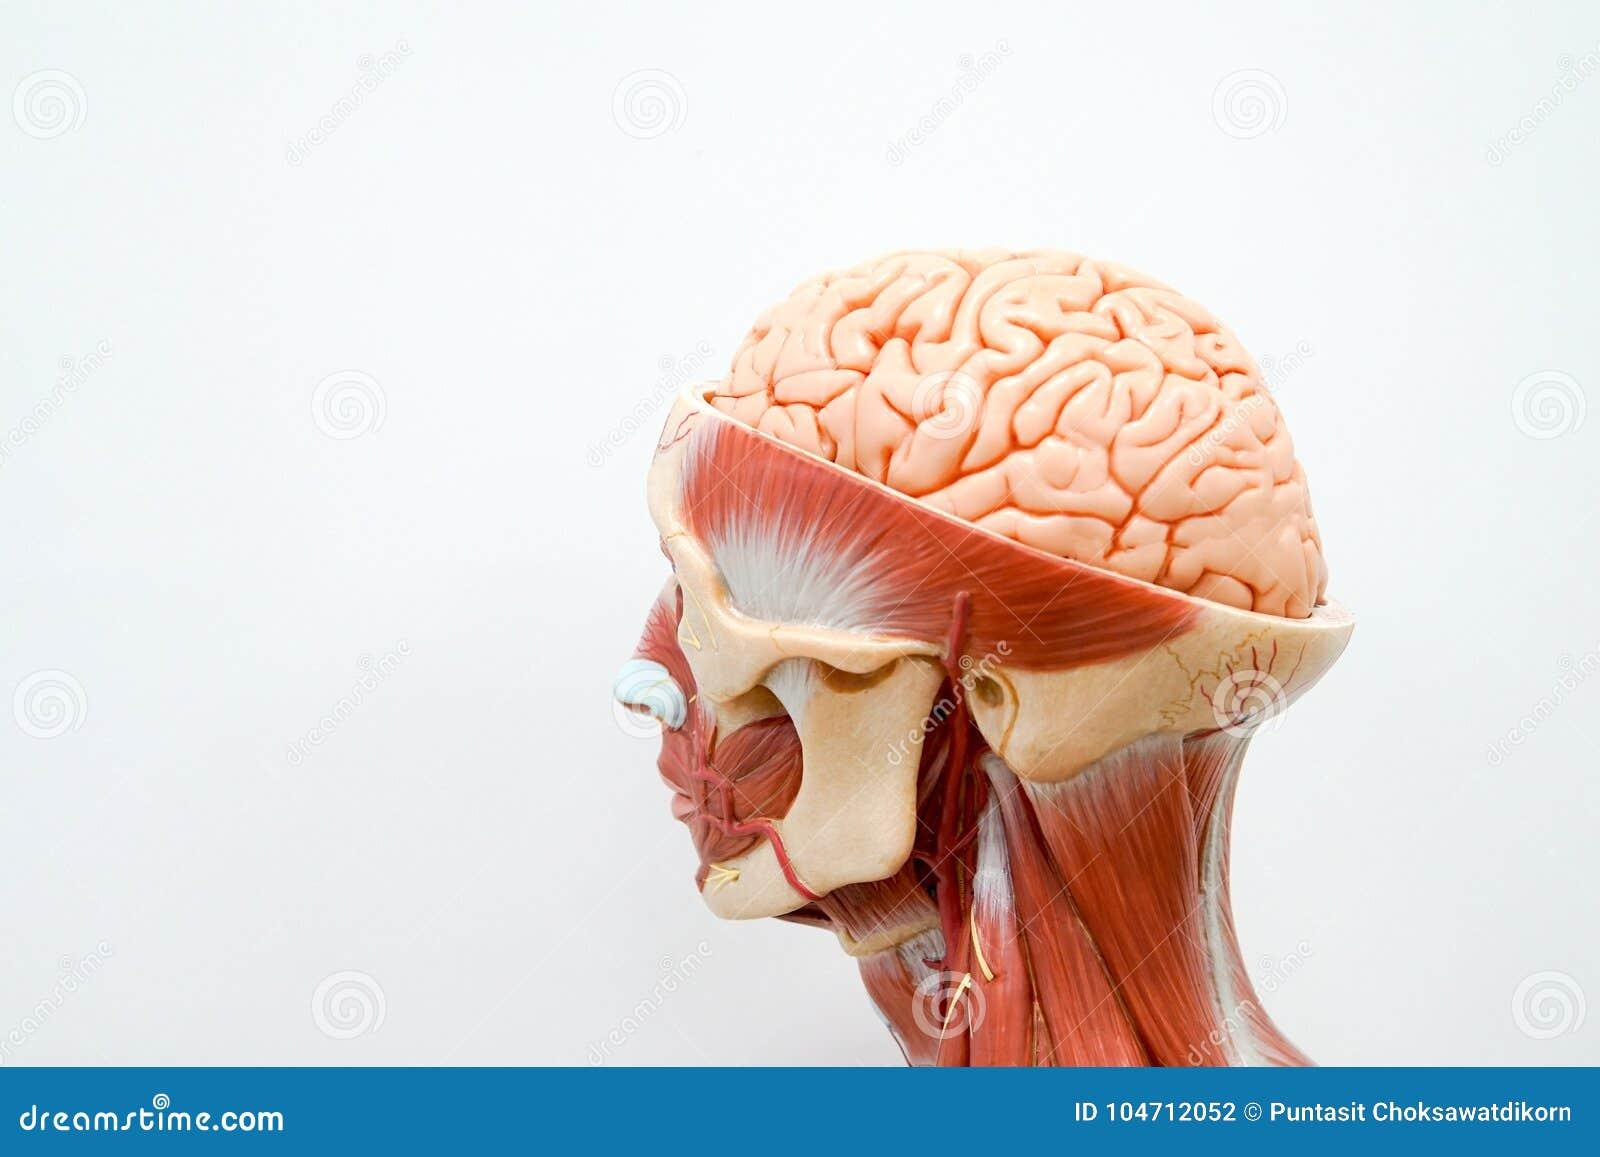 Human Head Anatomy Model Stock Photo Image Of Medicine 104712052